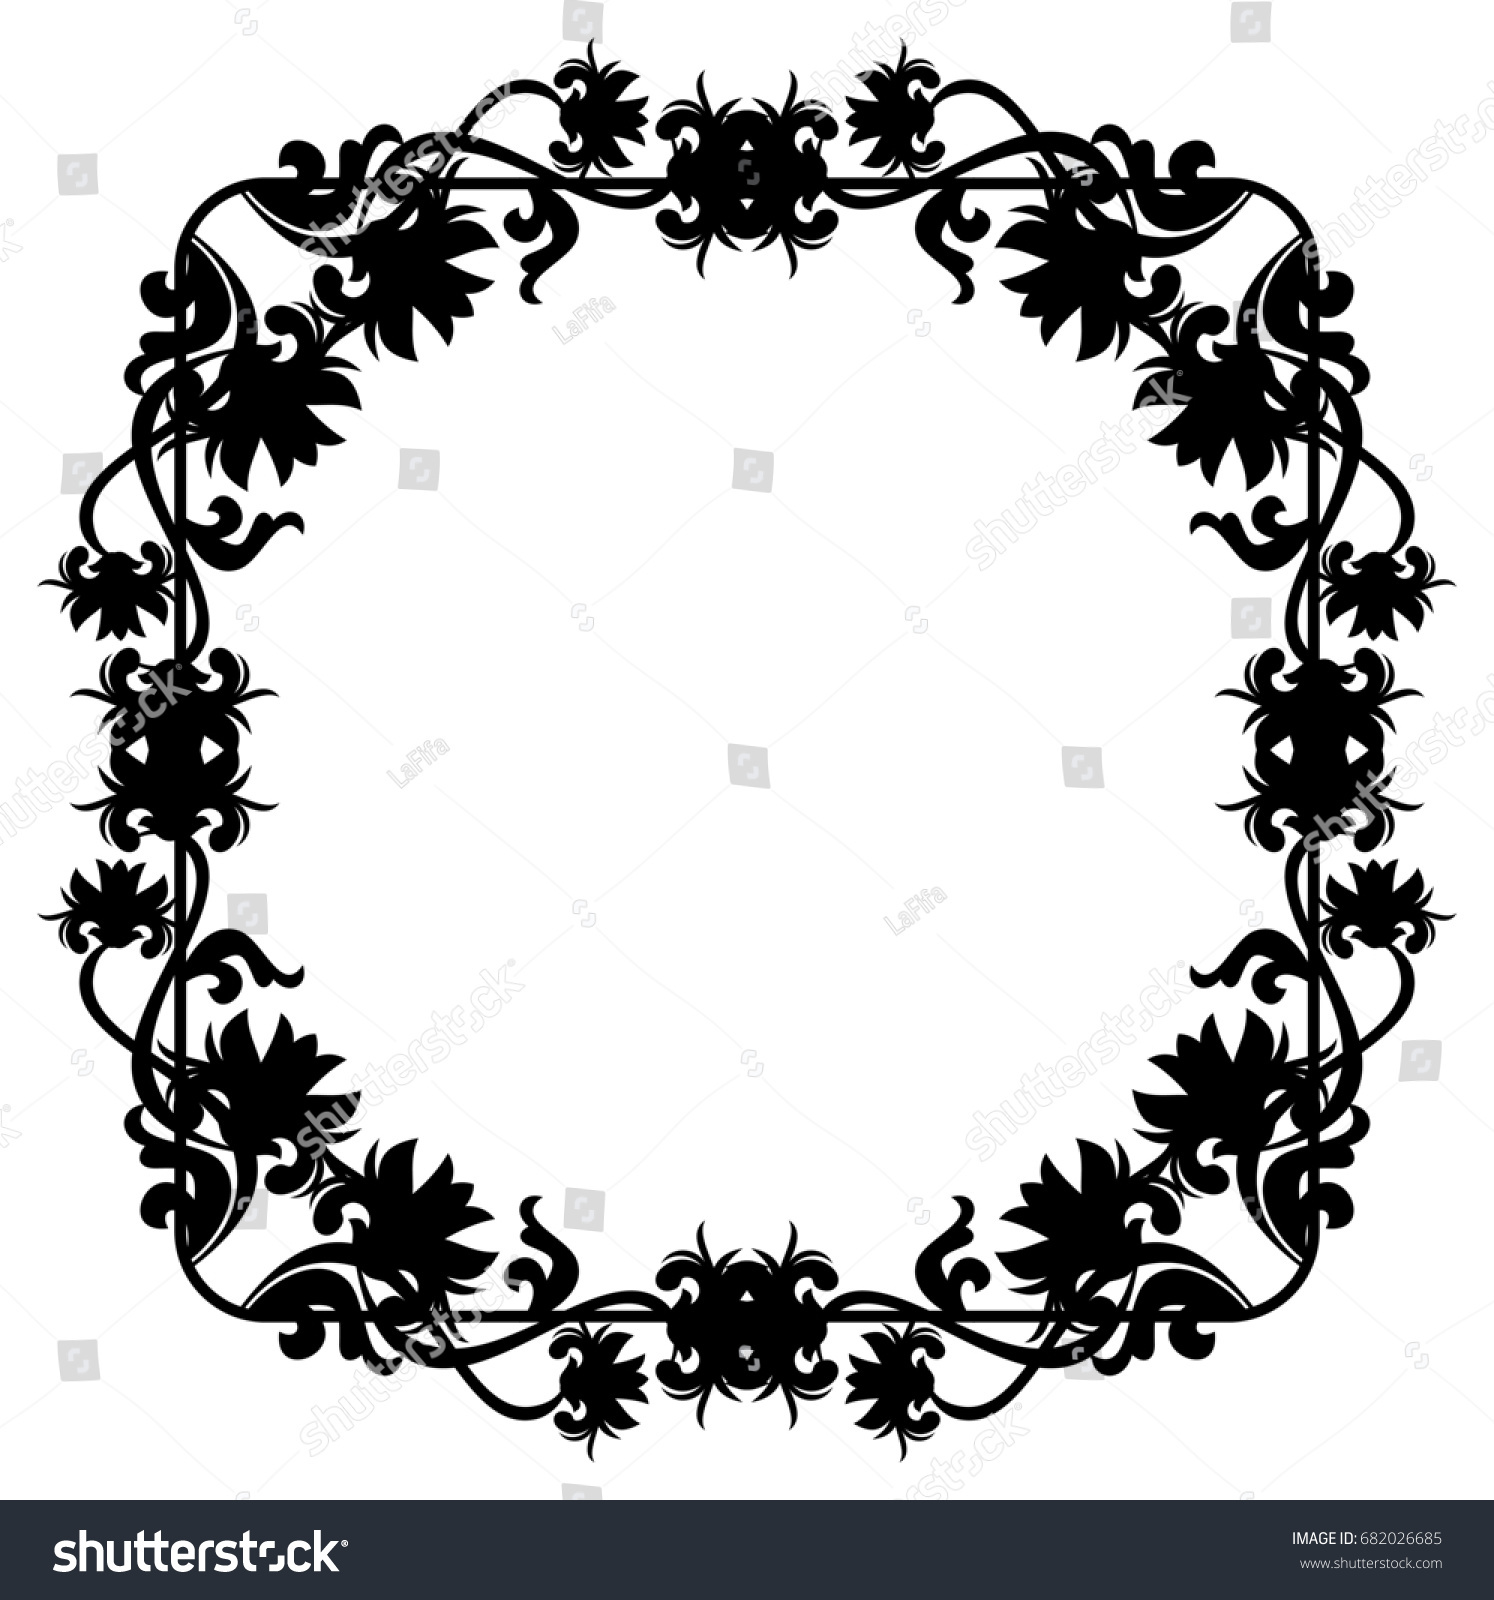 Black And White Silhouette Floral Frame Raster Clip Art Ez Canvas